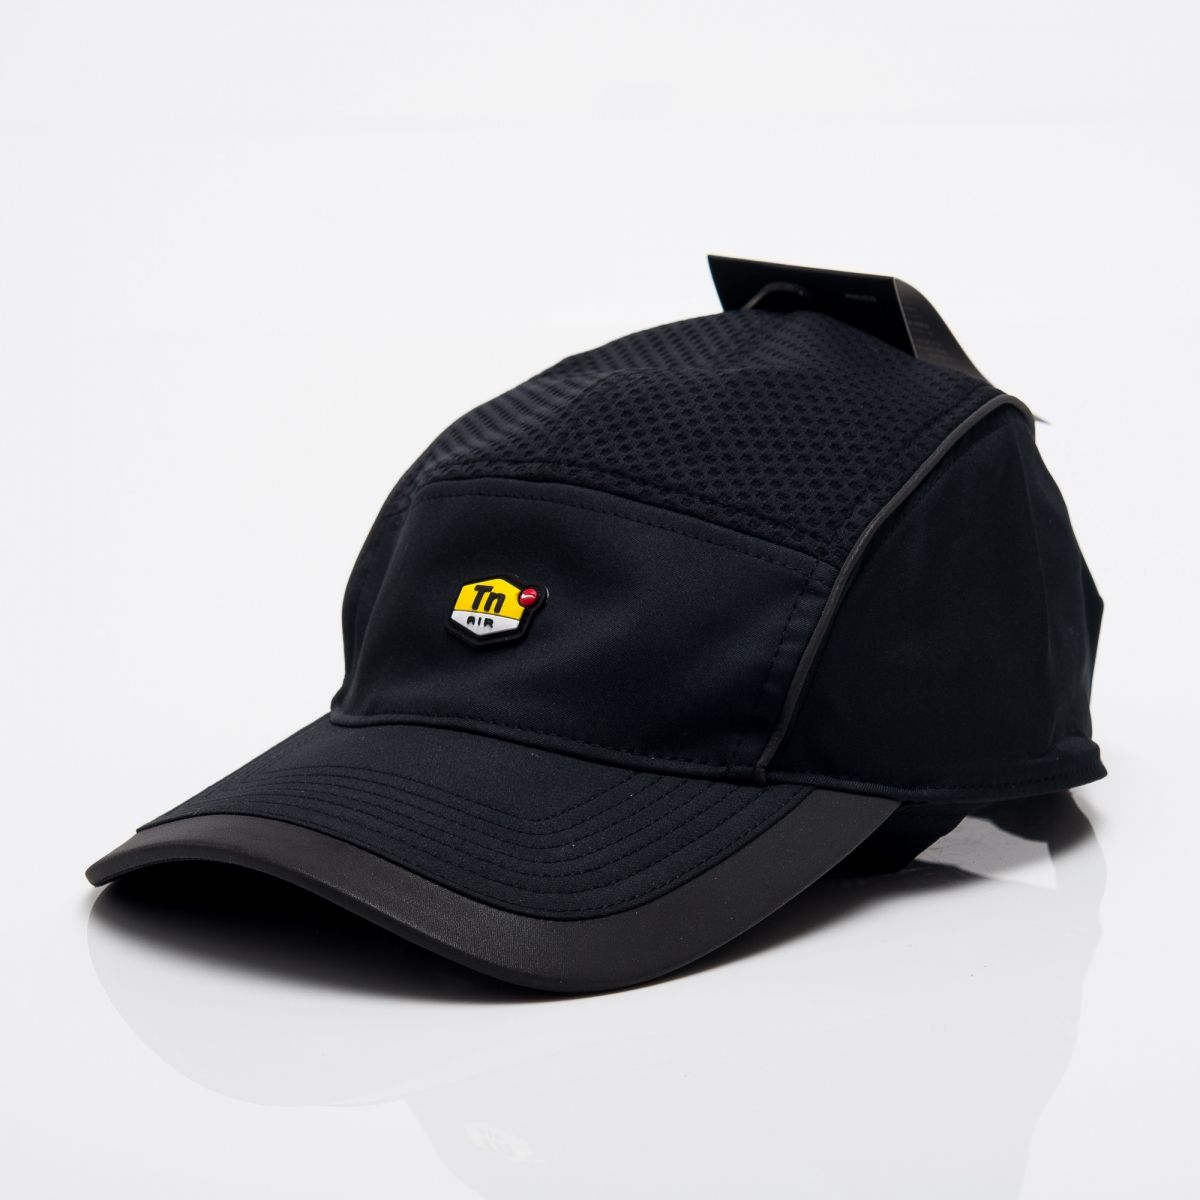 8e1c7bda68 Type Caps Nike Sportswear TN Air AeroBill AW84 Cap